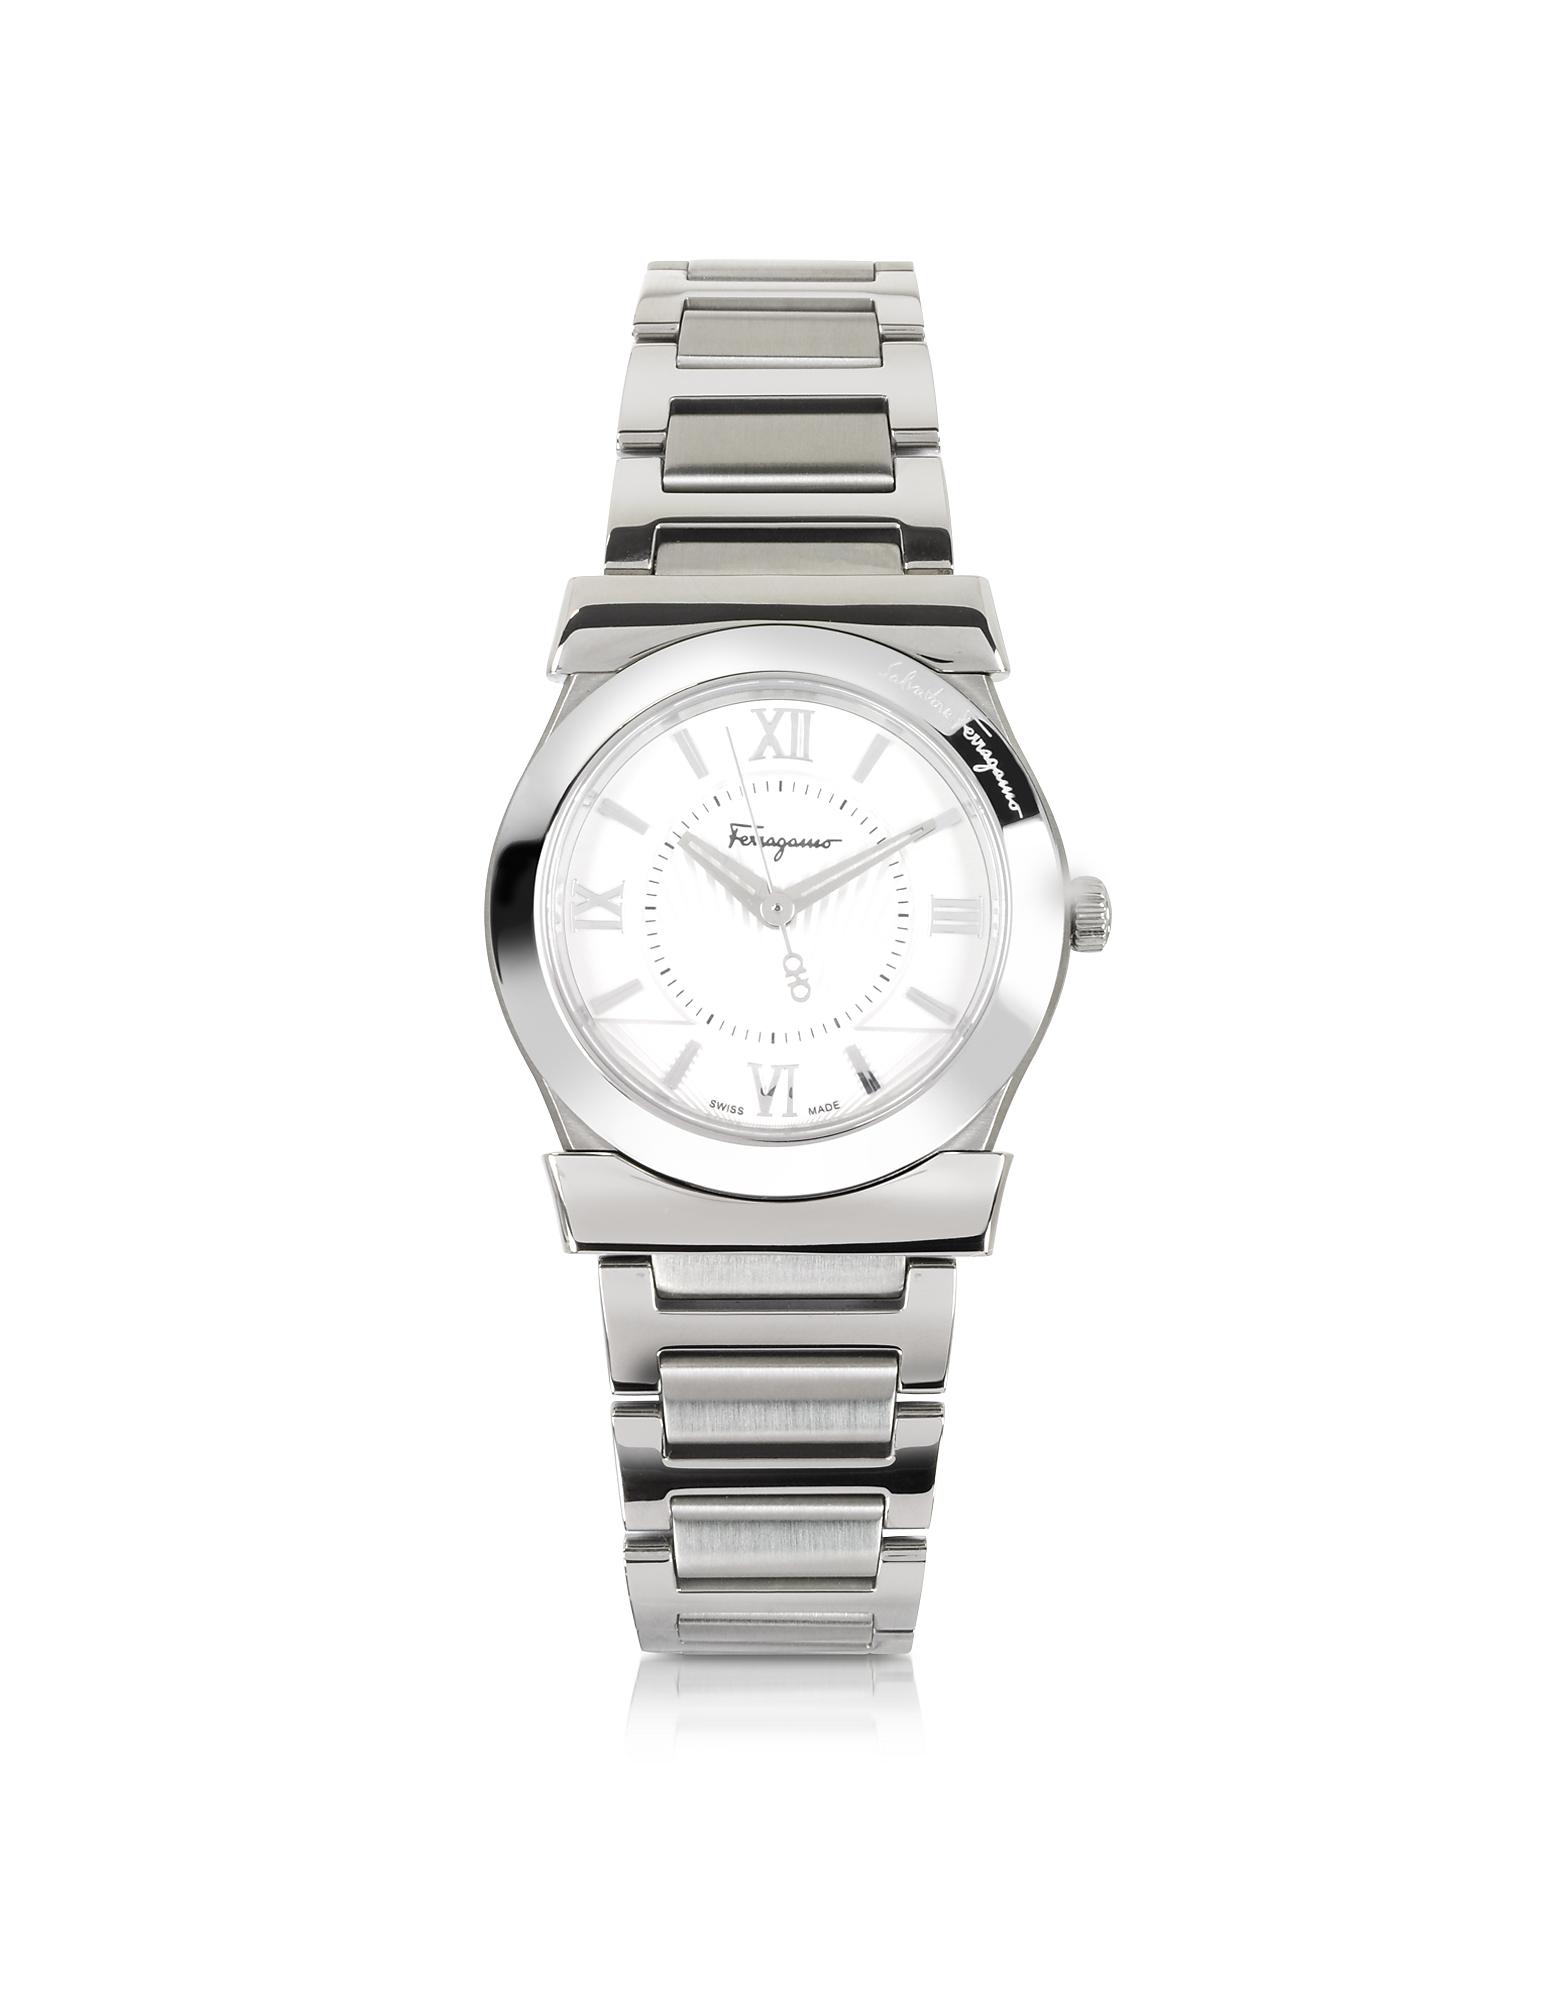 Salvatore Ferragamo Women's Watches, Vega Silver Tone Stainless Steel Women's Watch